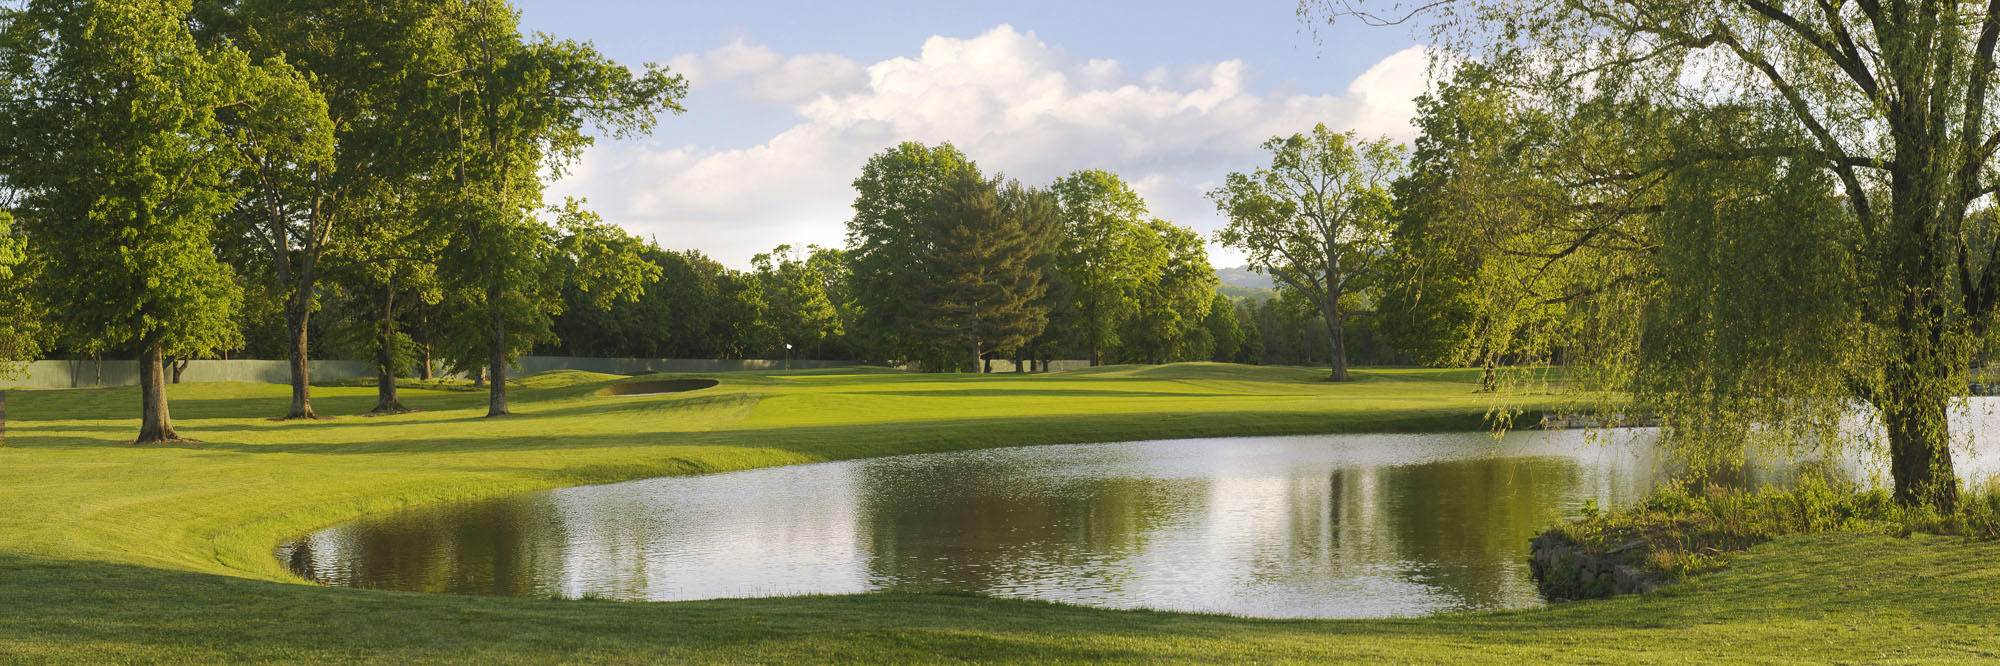 Golf Course Image - The Greenbrier Meadows Course No. 1